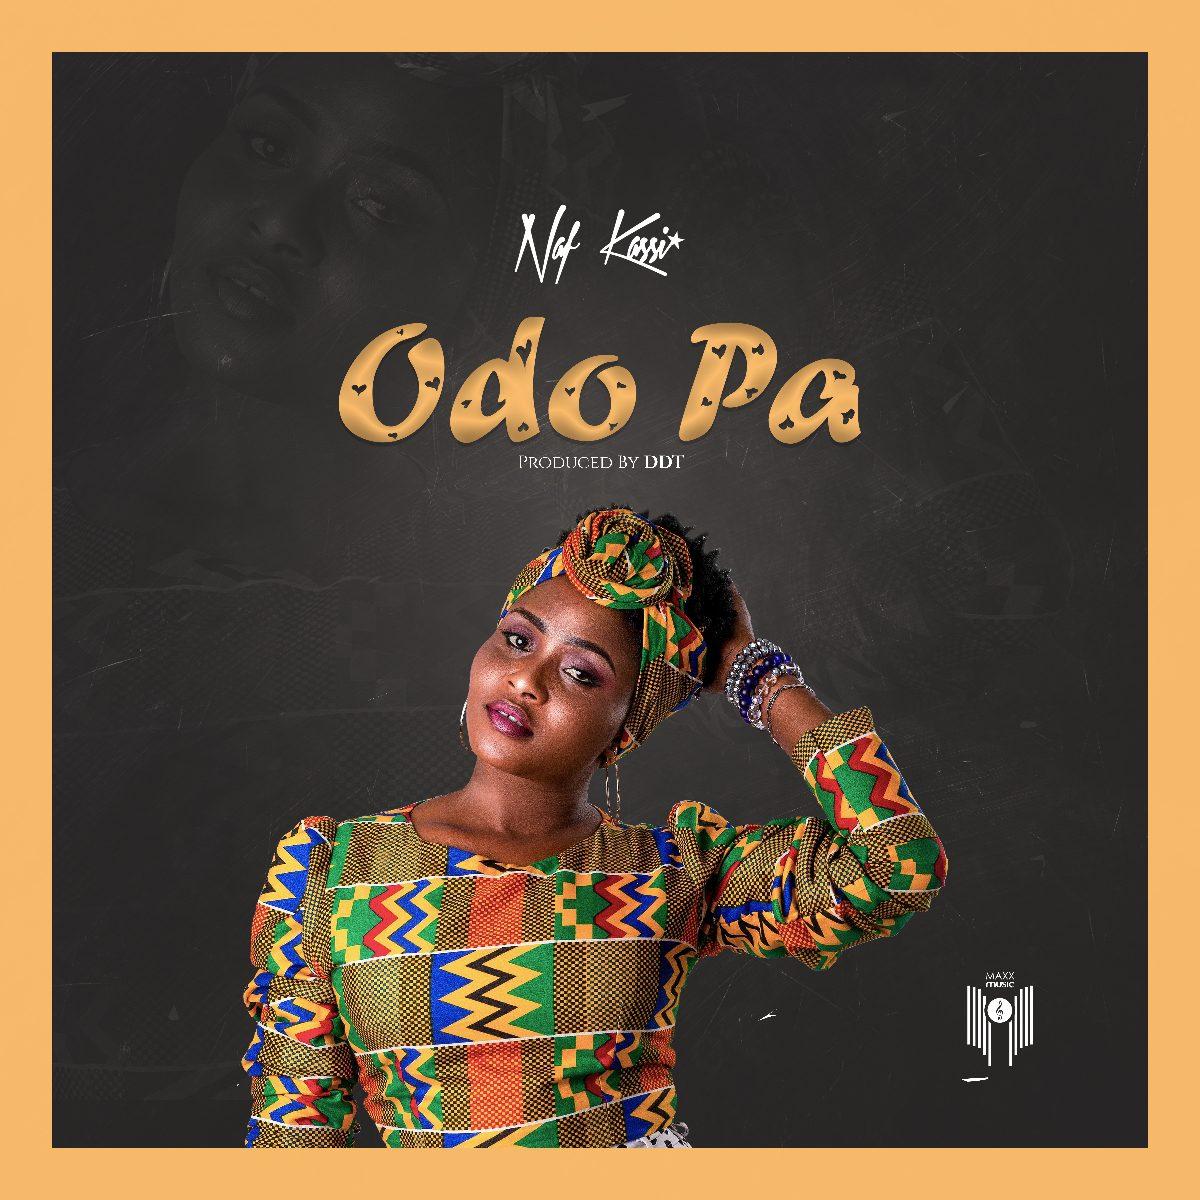 Naf Kassi - Odo Pa (Prod. By DDT)